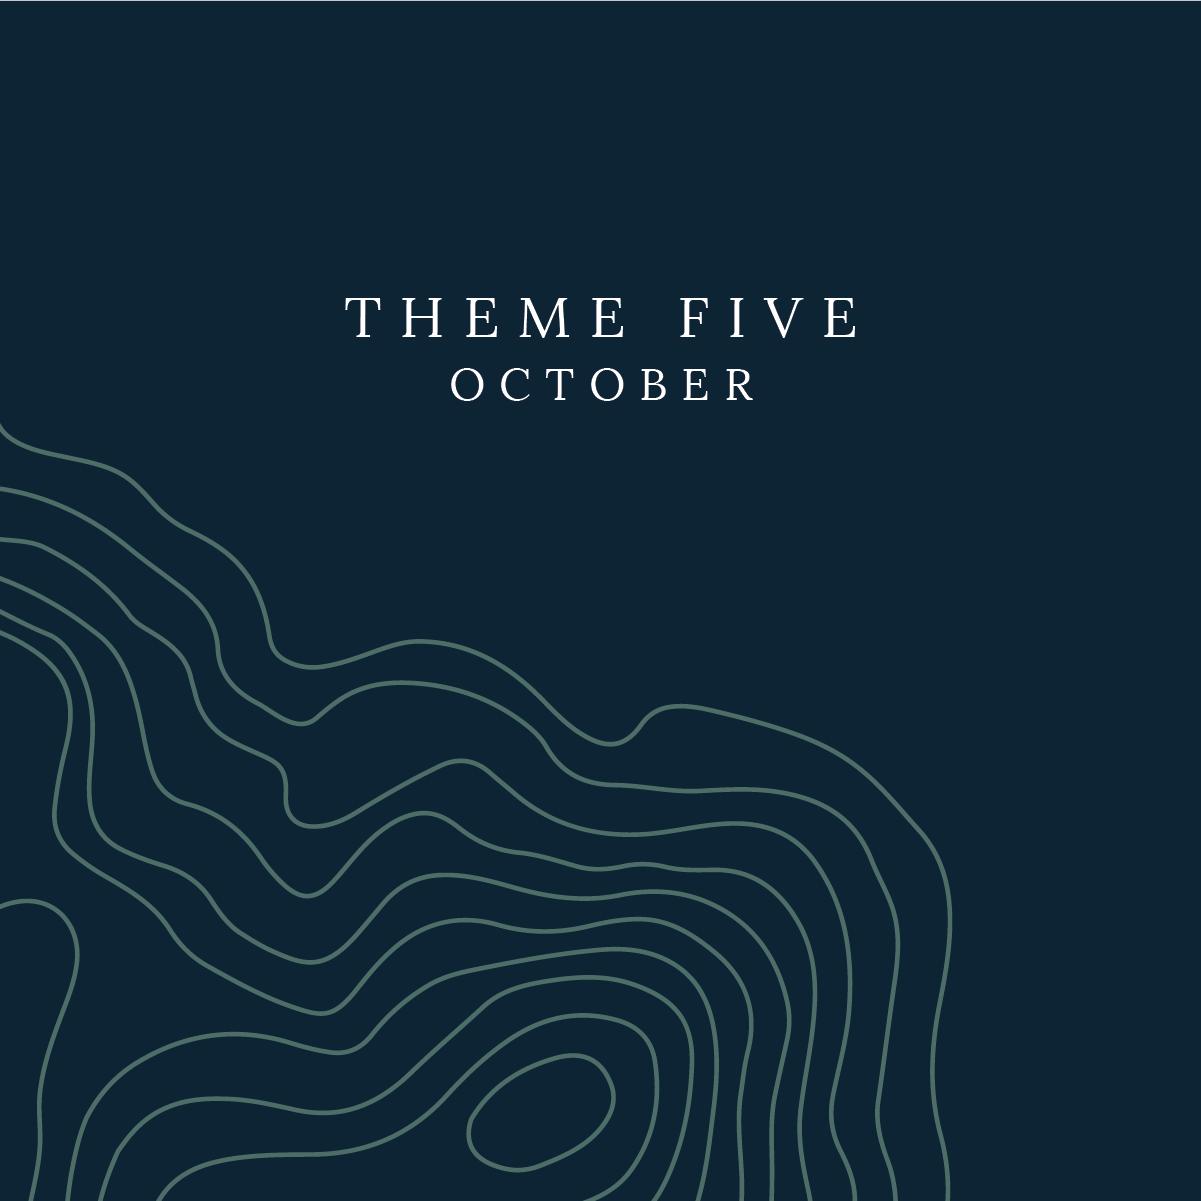 October Theme Thumbnails-12.png